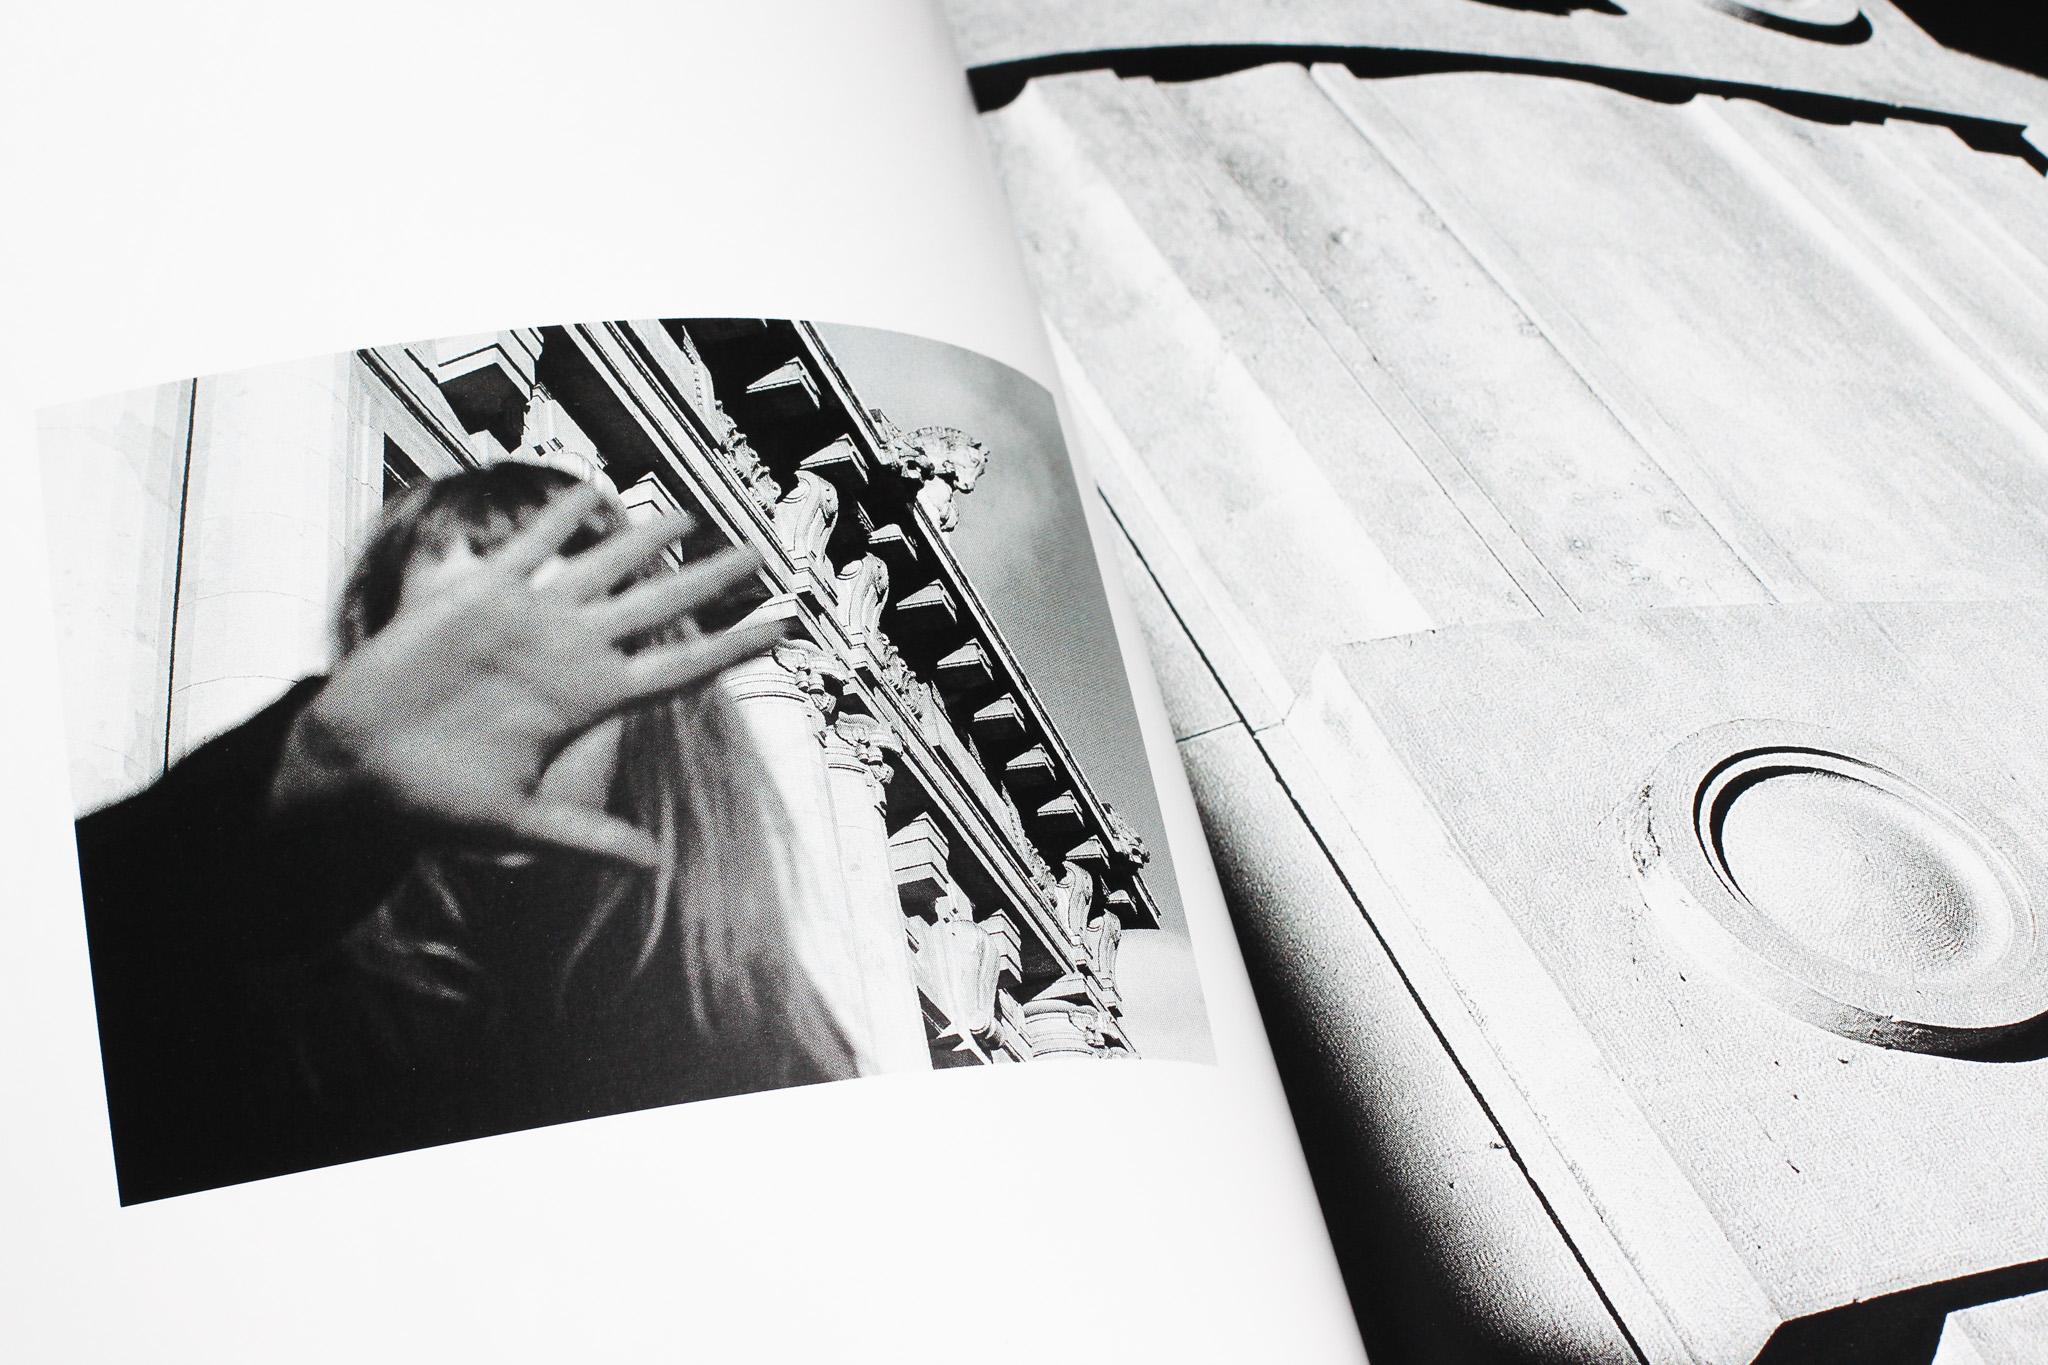 myss-keta-fanzine-rfm-2.jpg